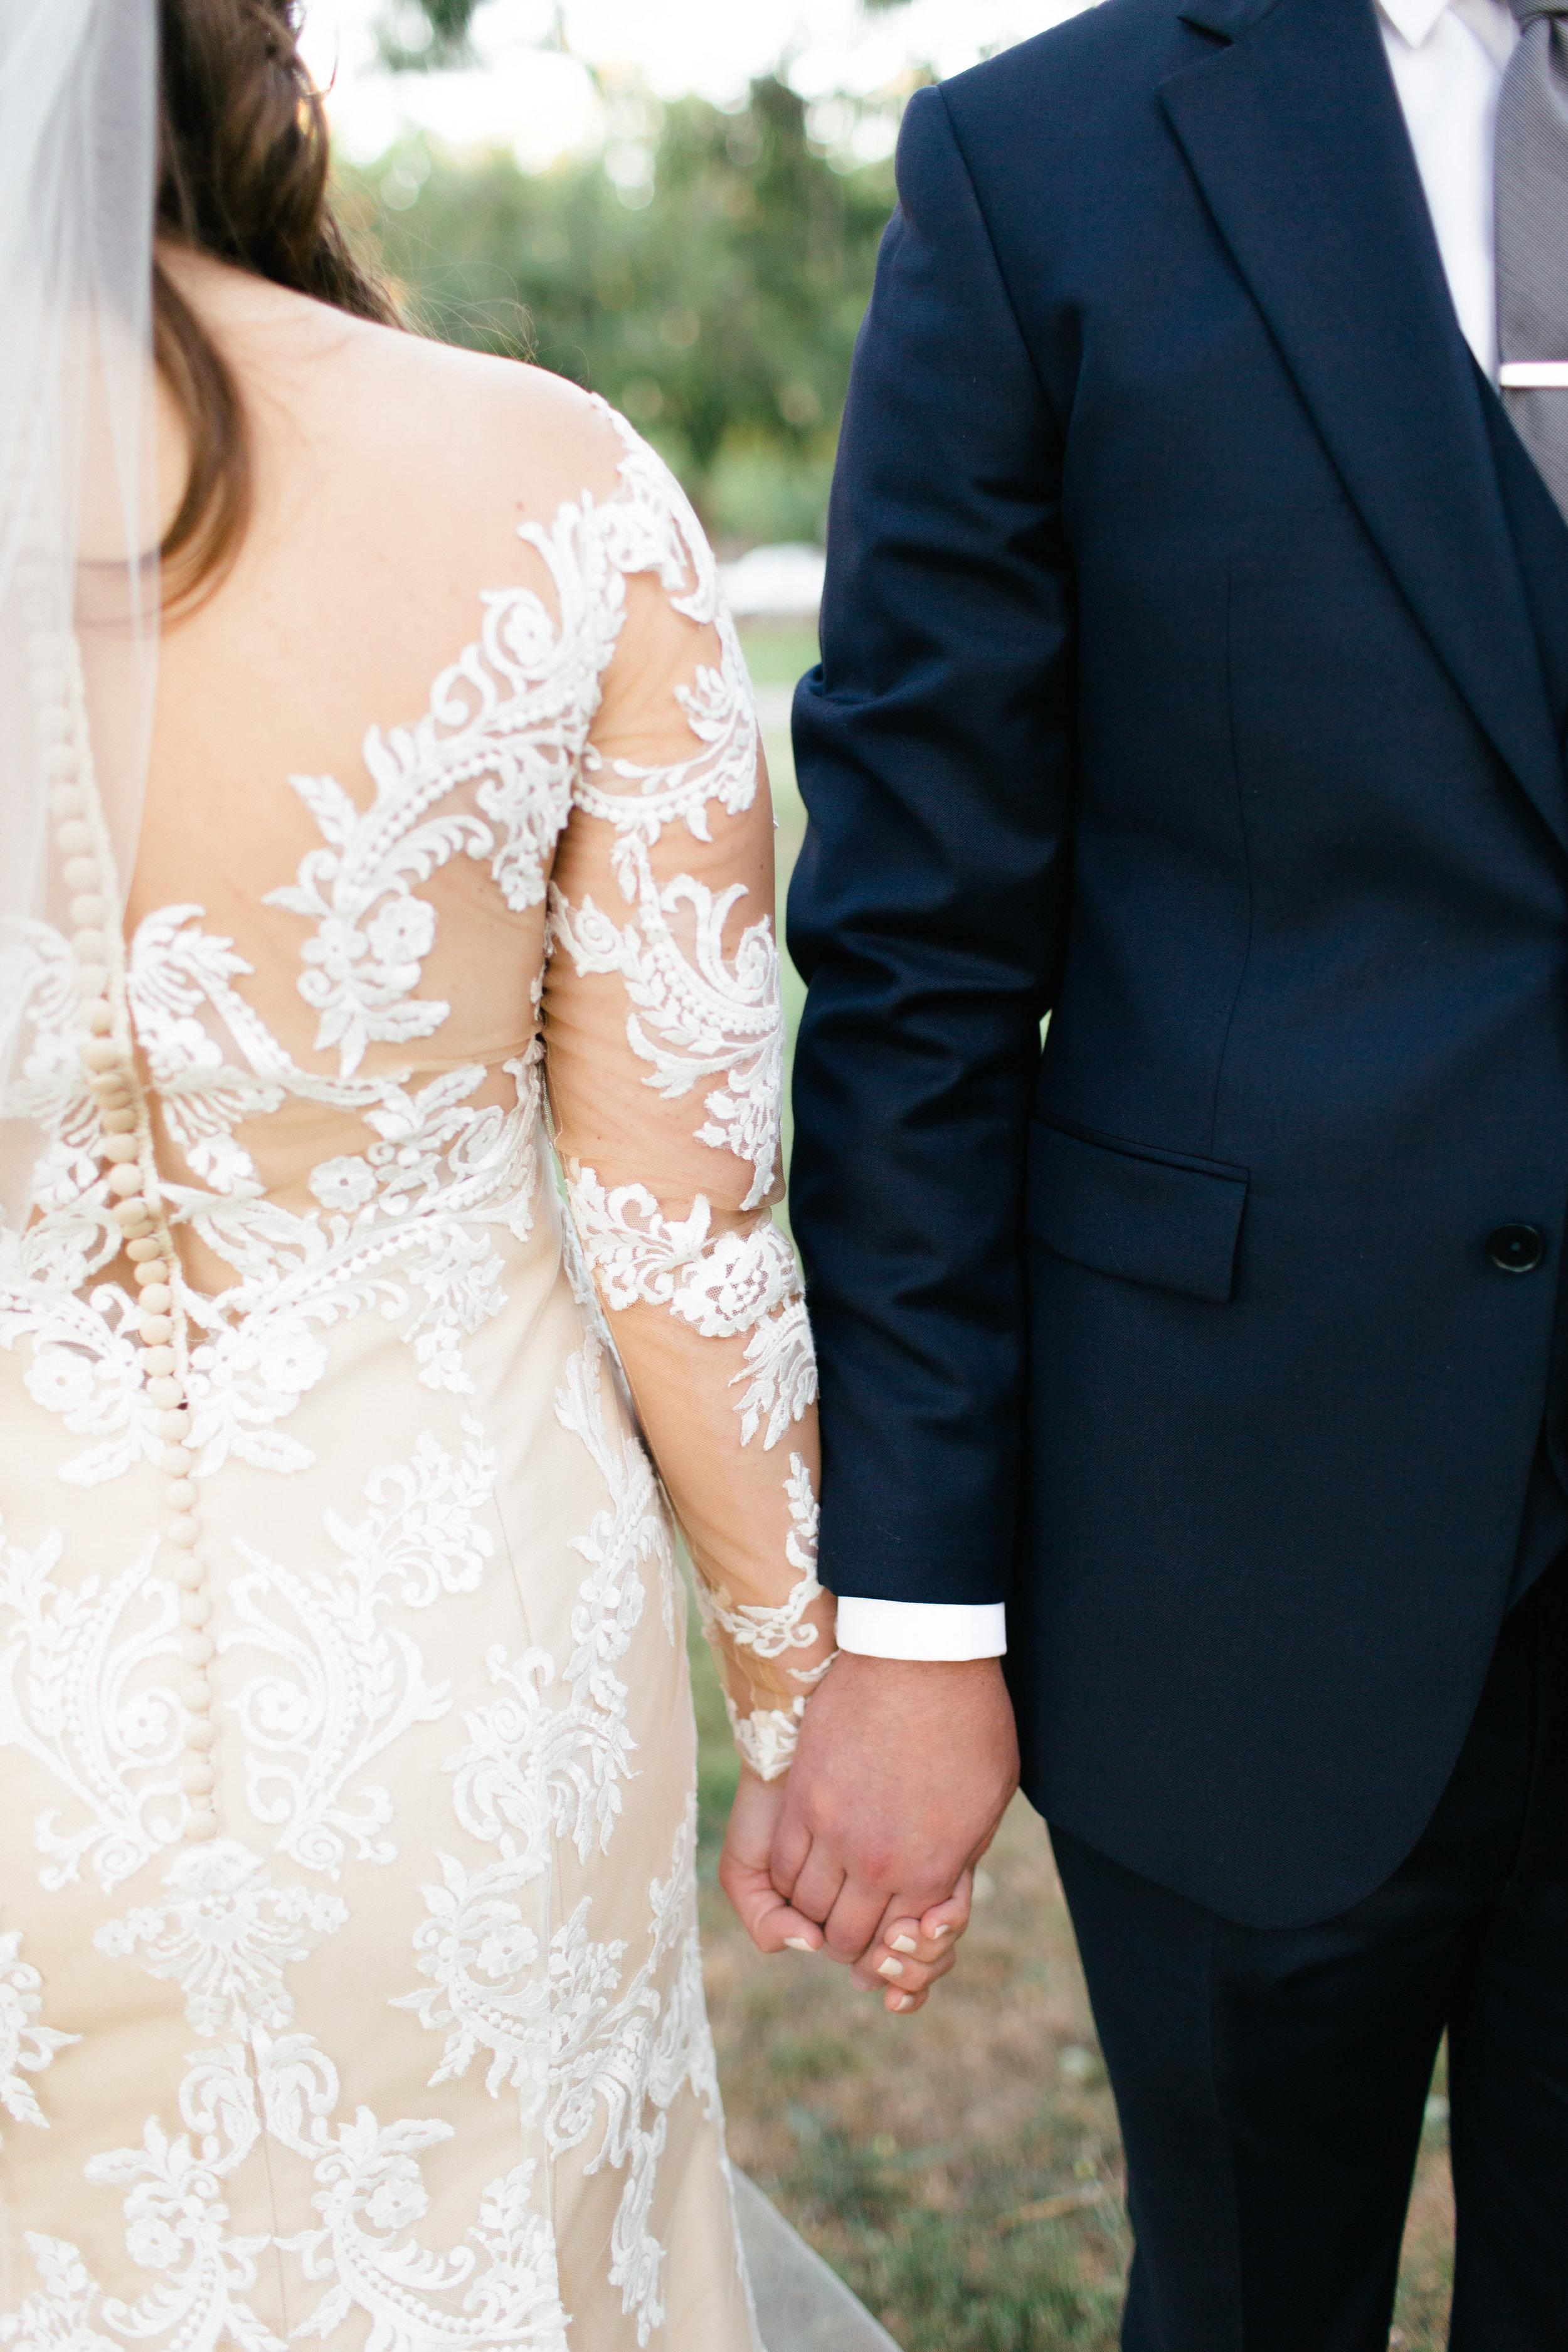 Dupon Circle Wedding | Washington DC Wedding Photography | Rebecca Wilcher Photography -21.jpg